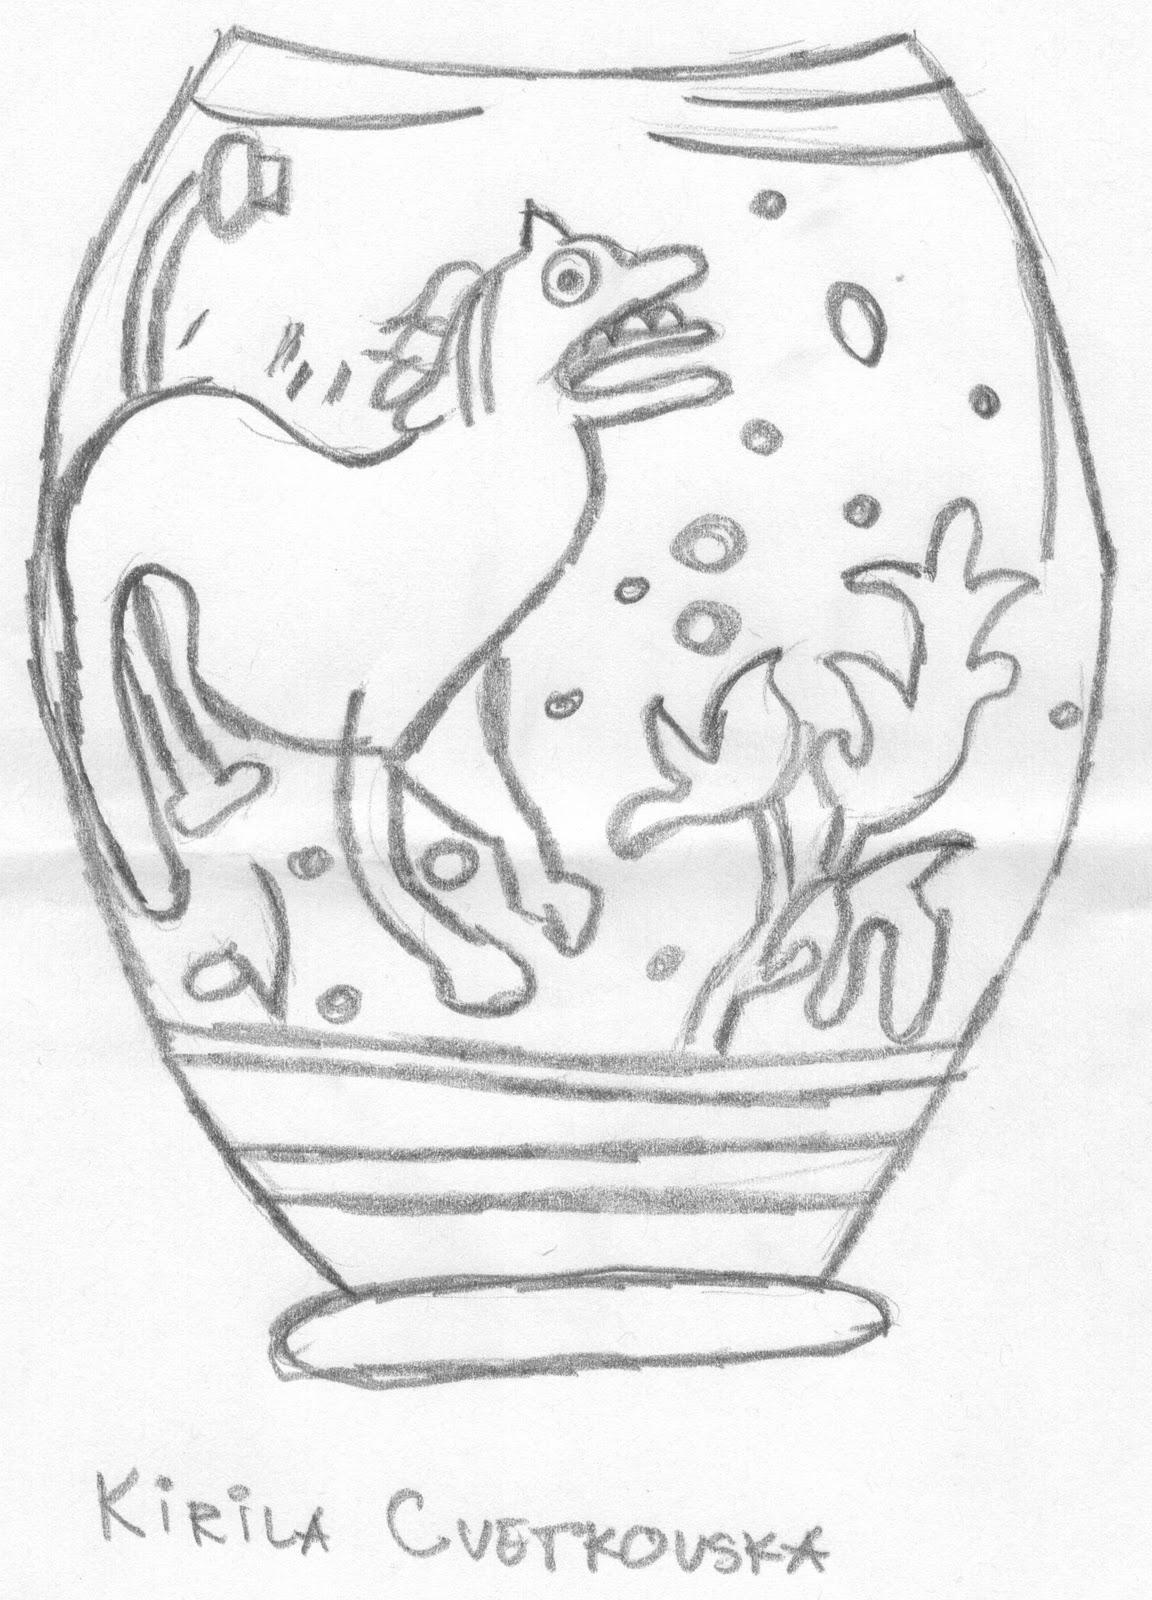 AH 142: Representation of Animals in Roman Art of the